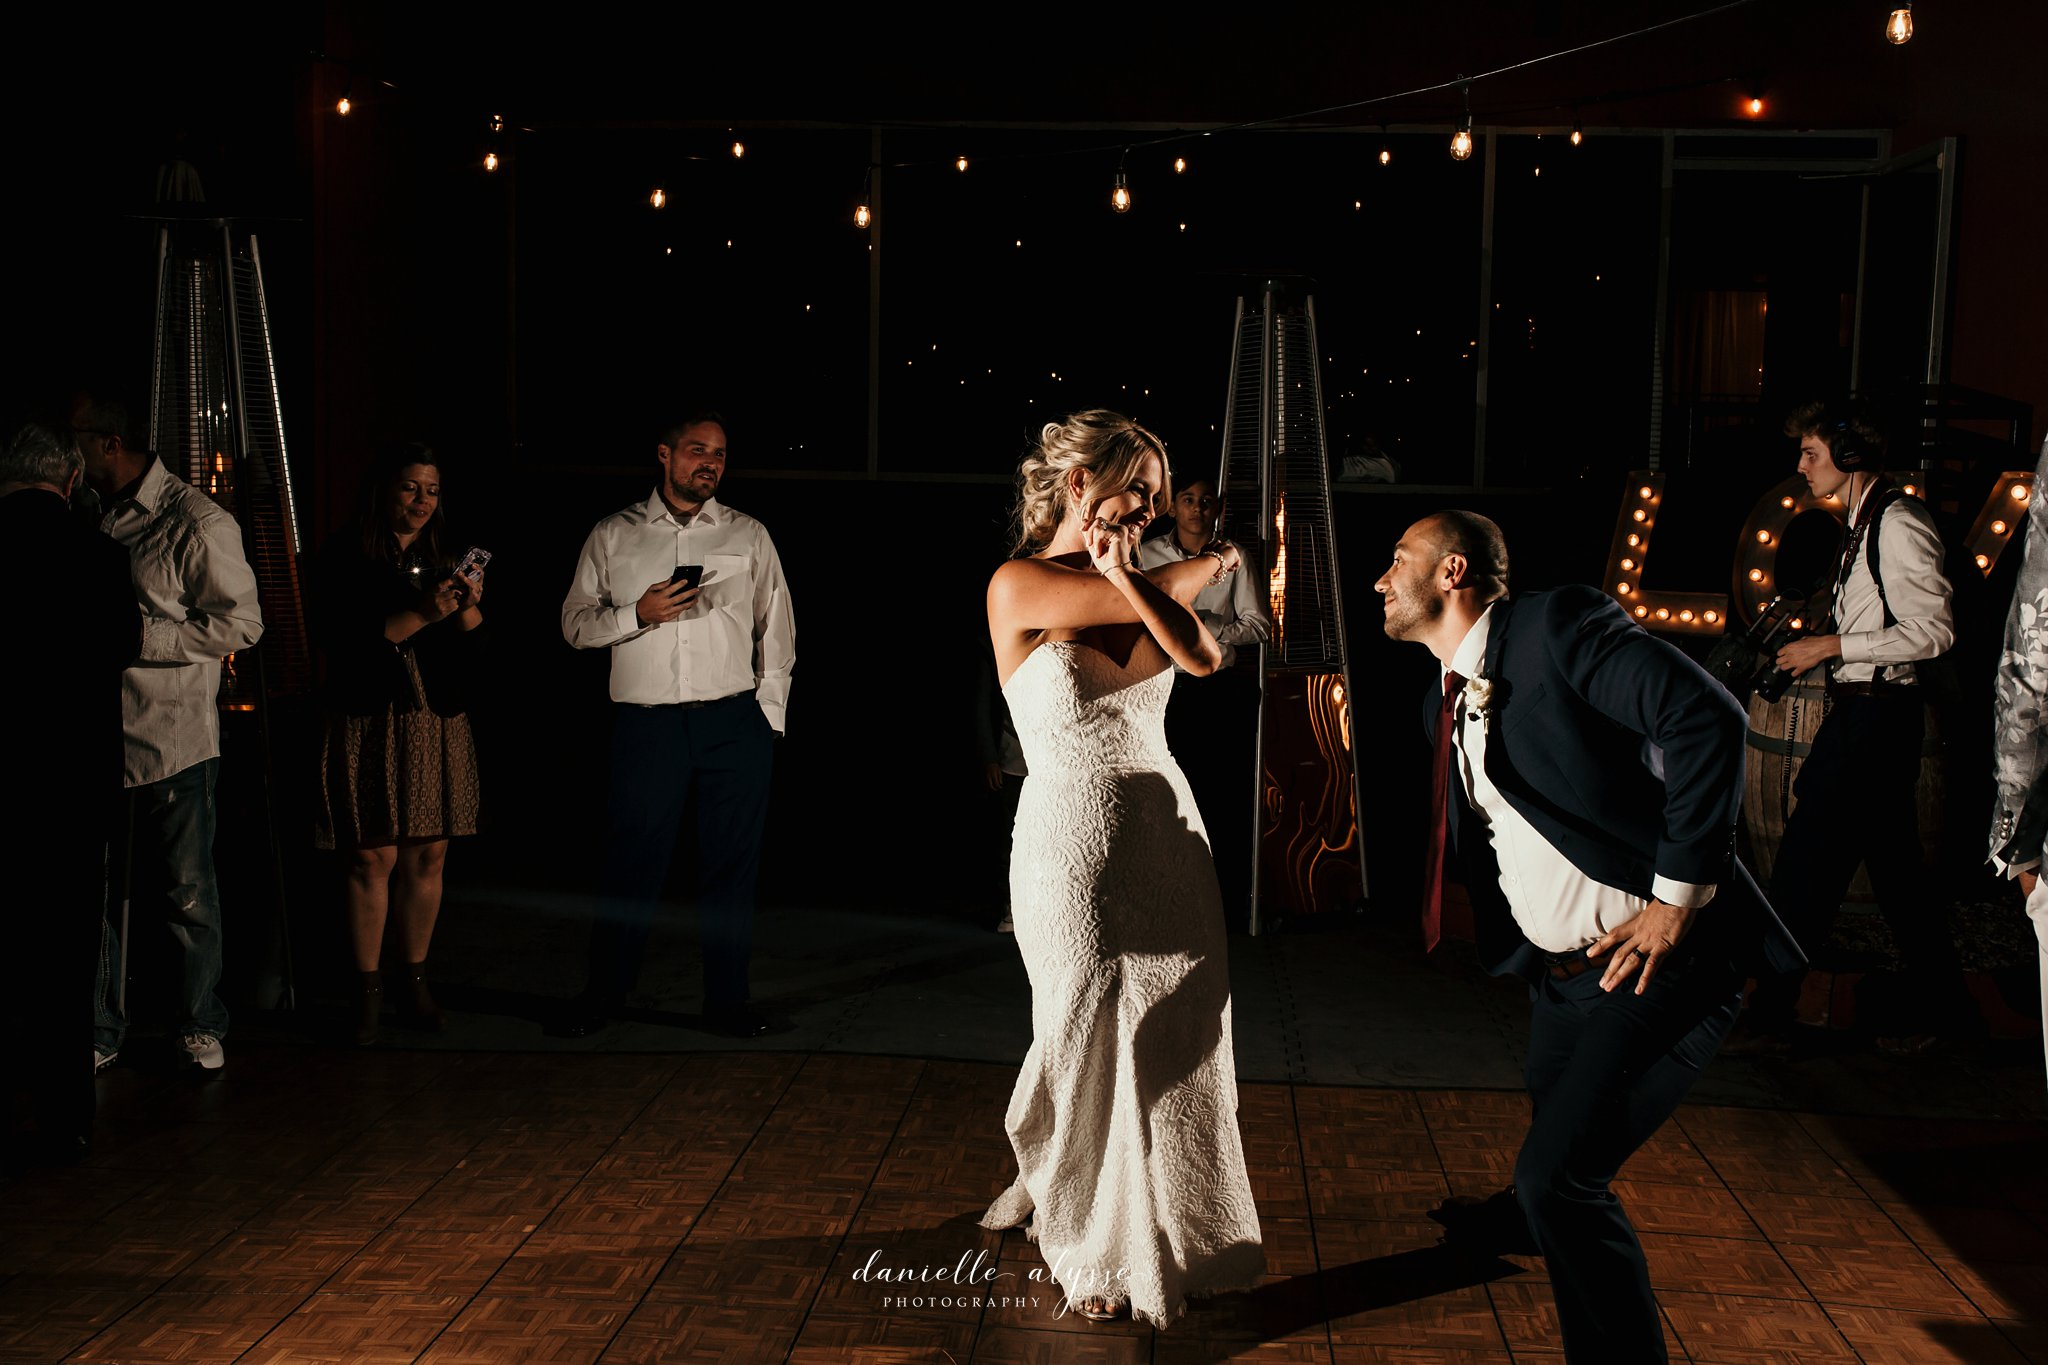 180831_wedding_stephanie_heavenly_south_lake_tahoe_danielle_alysse_photography_destination_blog_1166_WEB.jpg